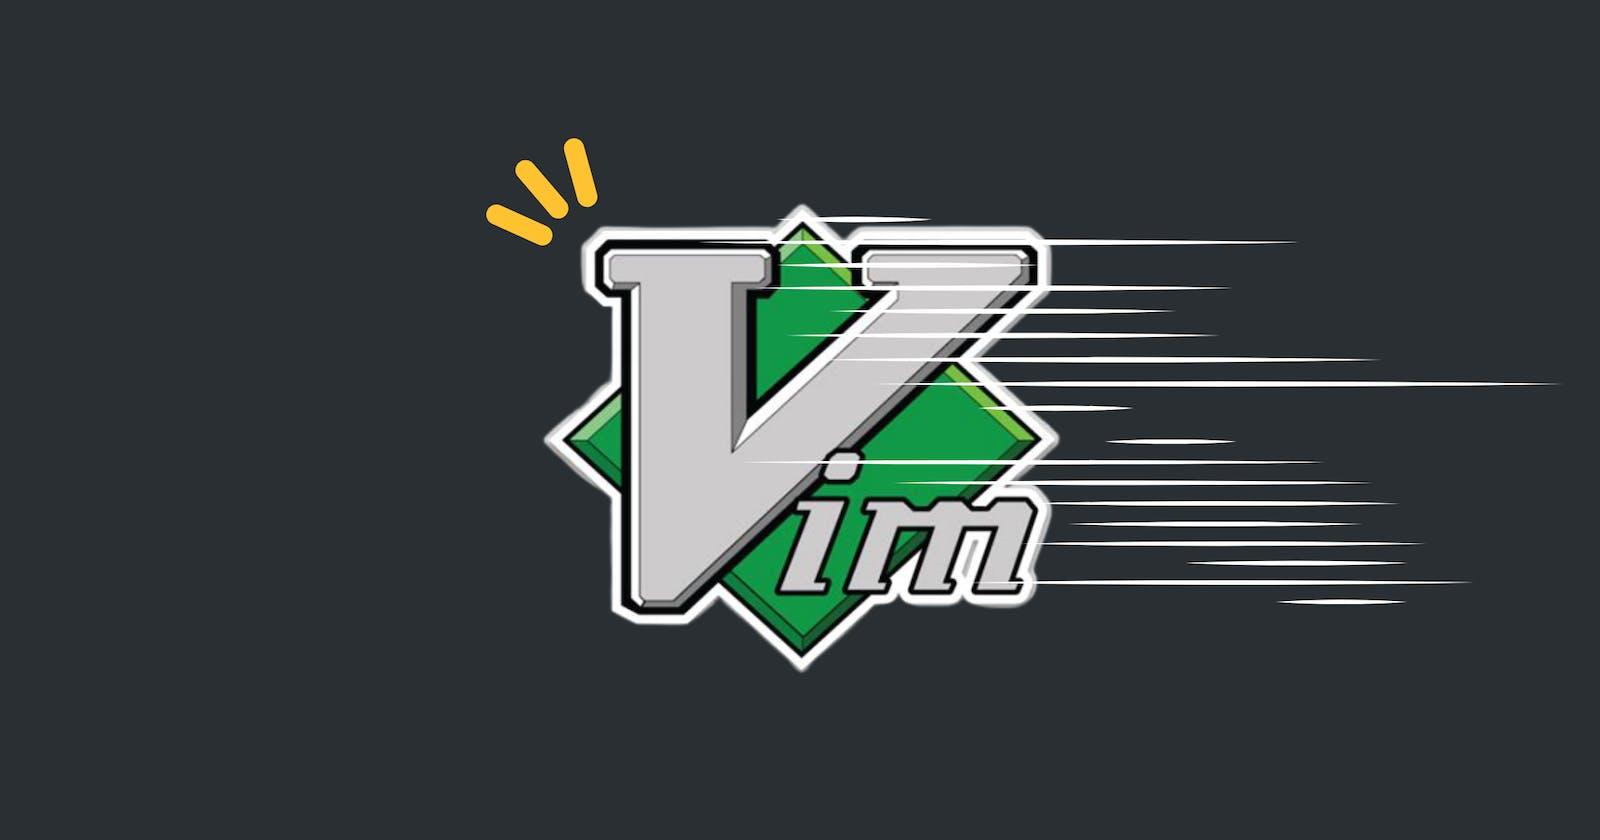 Vim: Enhancing movement speed